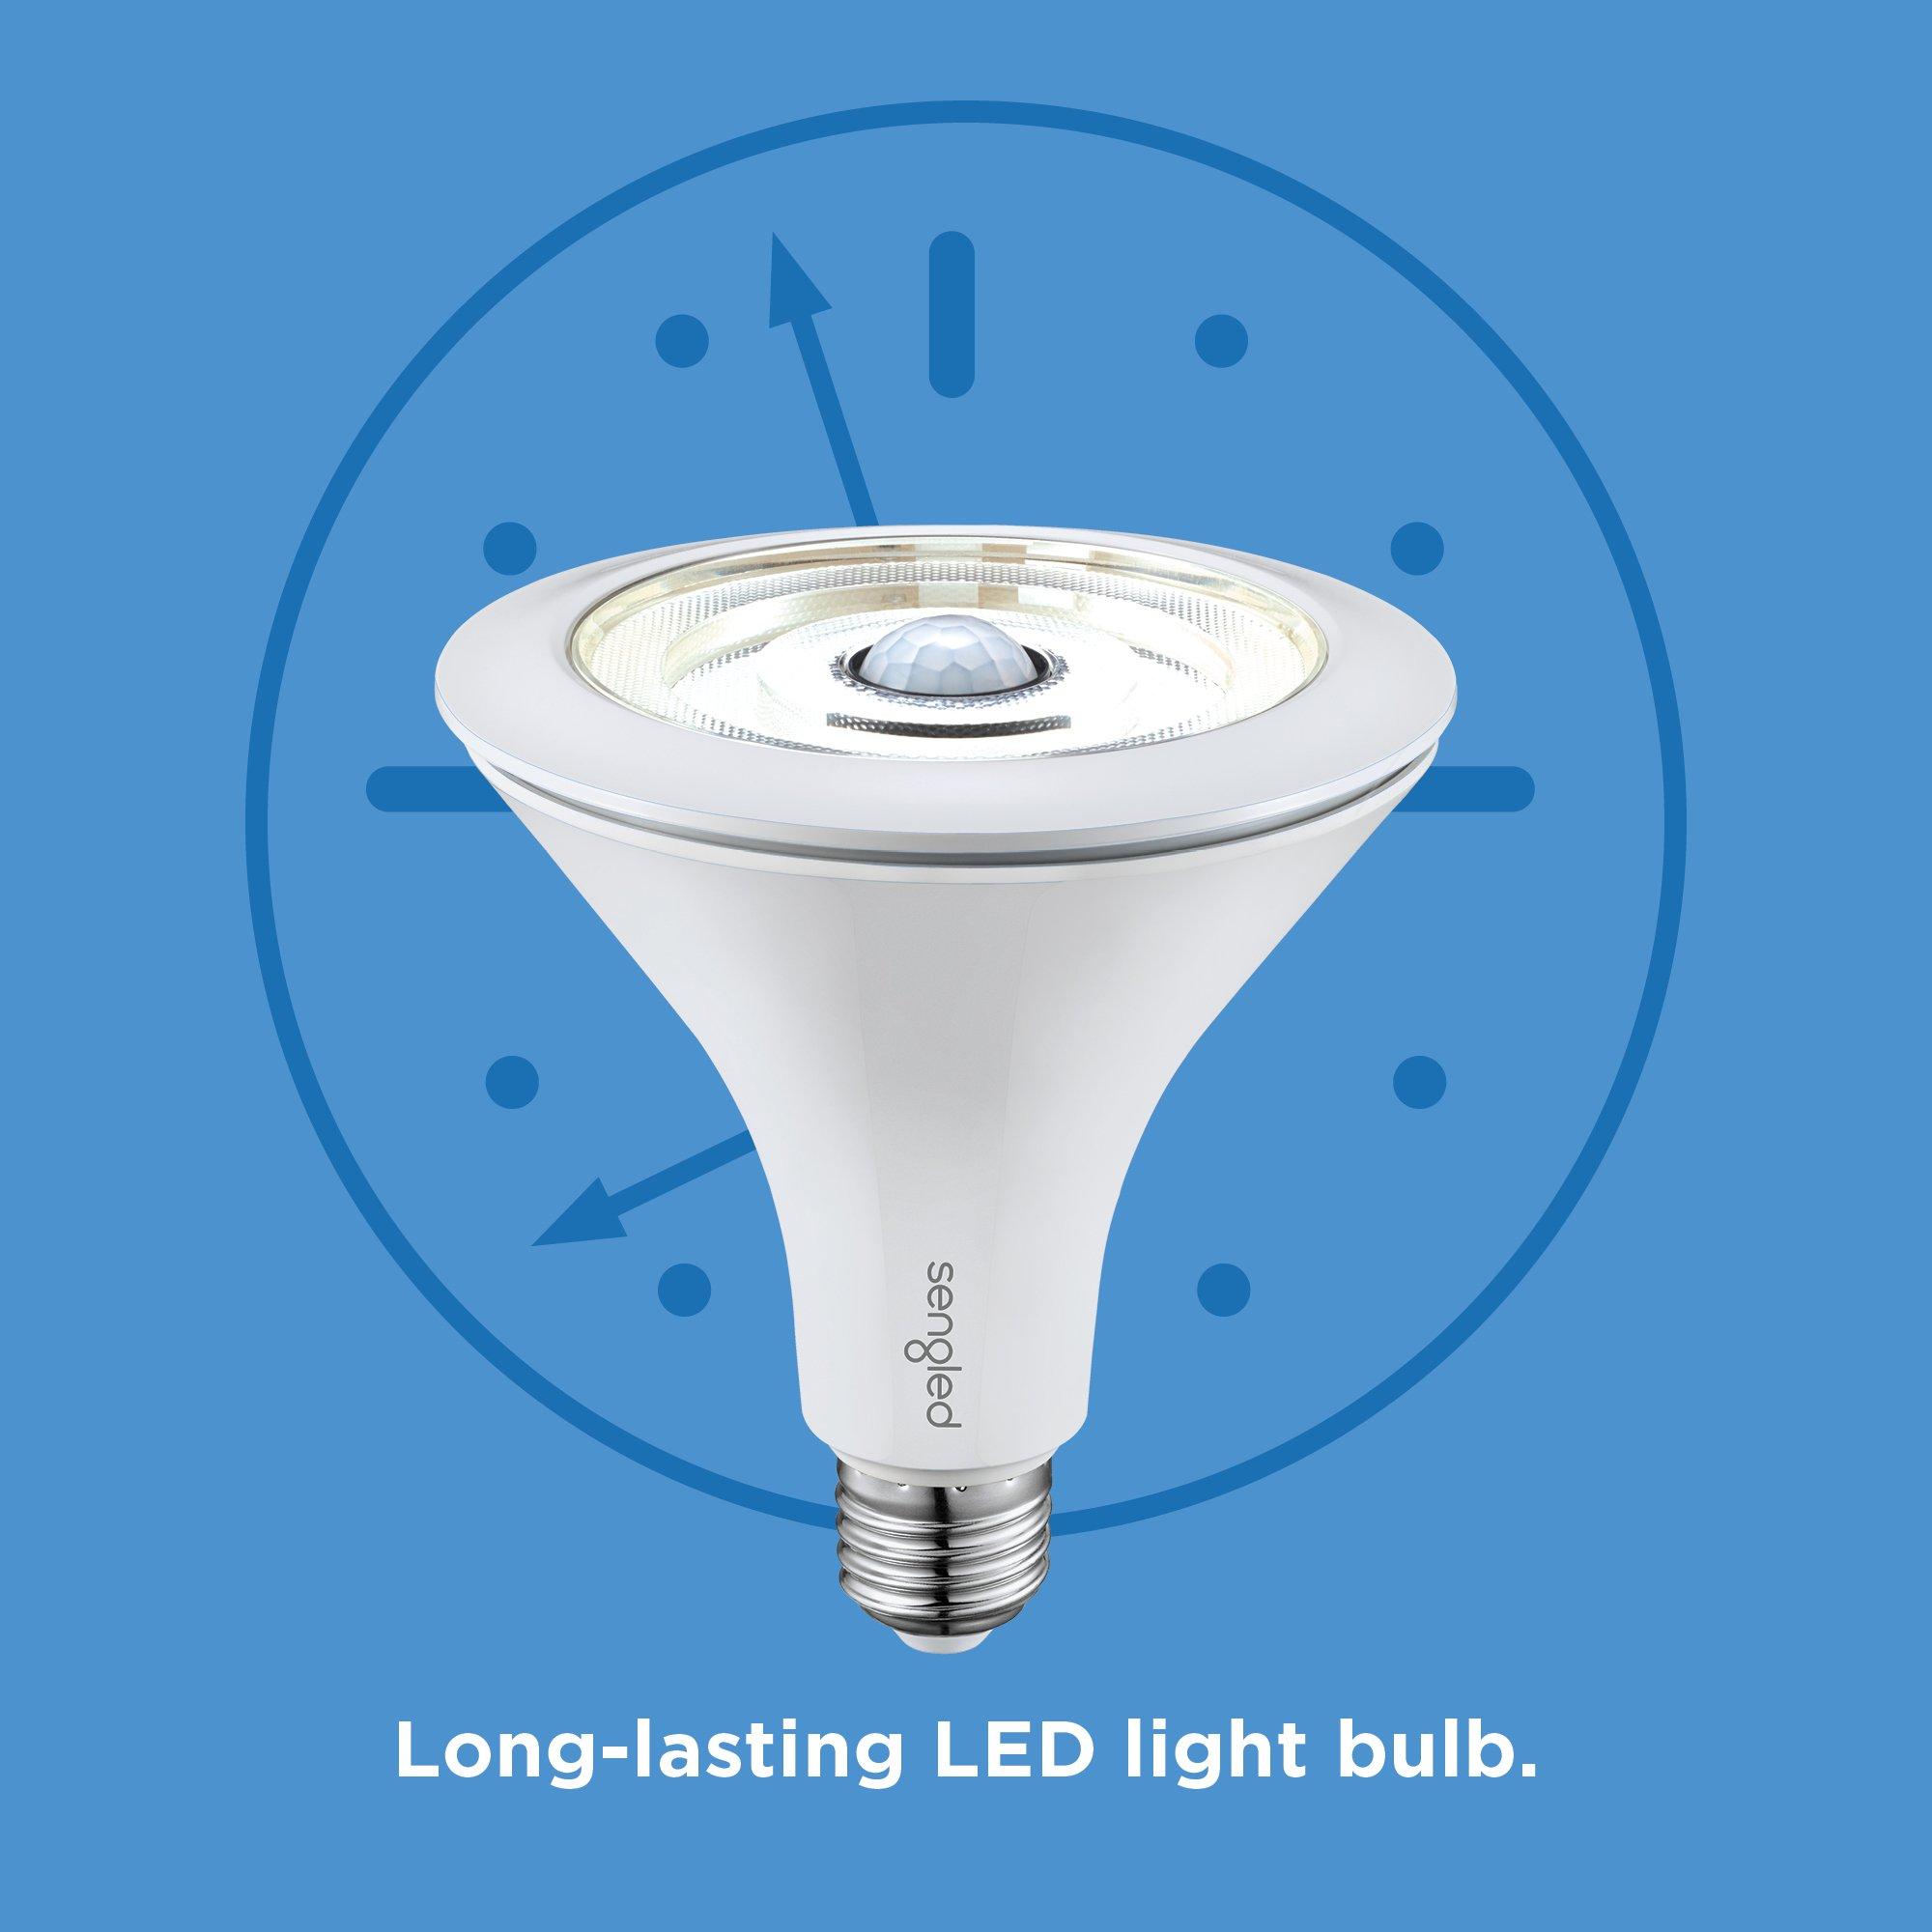 Sengled LED Flood Light with Motion Sensor & Daylight Sensor, Smart LED Light Bulb PAR38, Dusk to Dawn Bulb, Waterproof 3000K for Outdoor Use, 2 Pack by Sengled (Image #8)